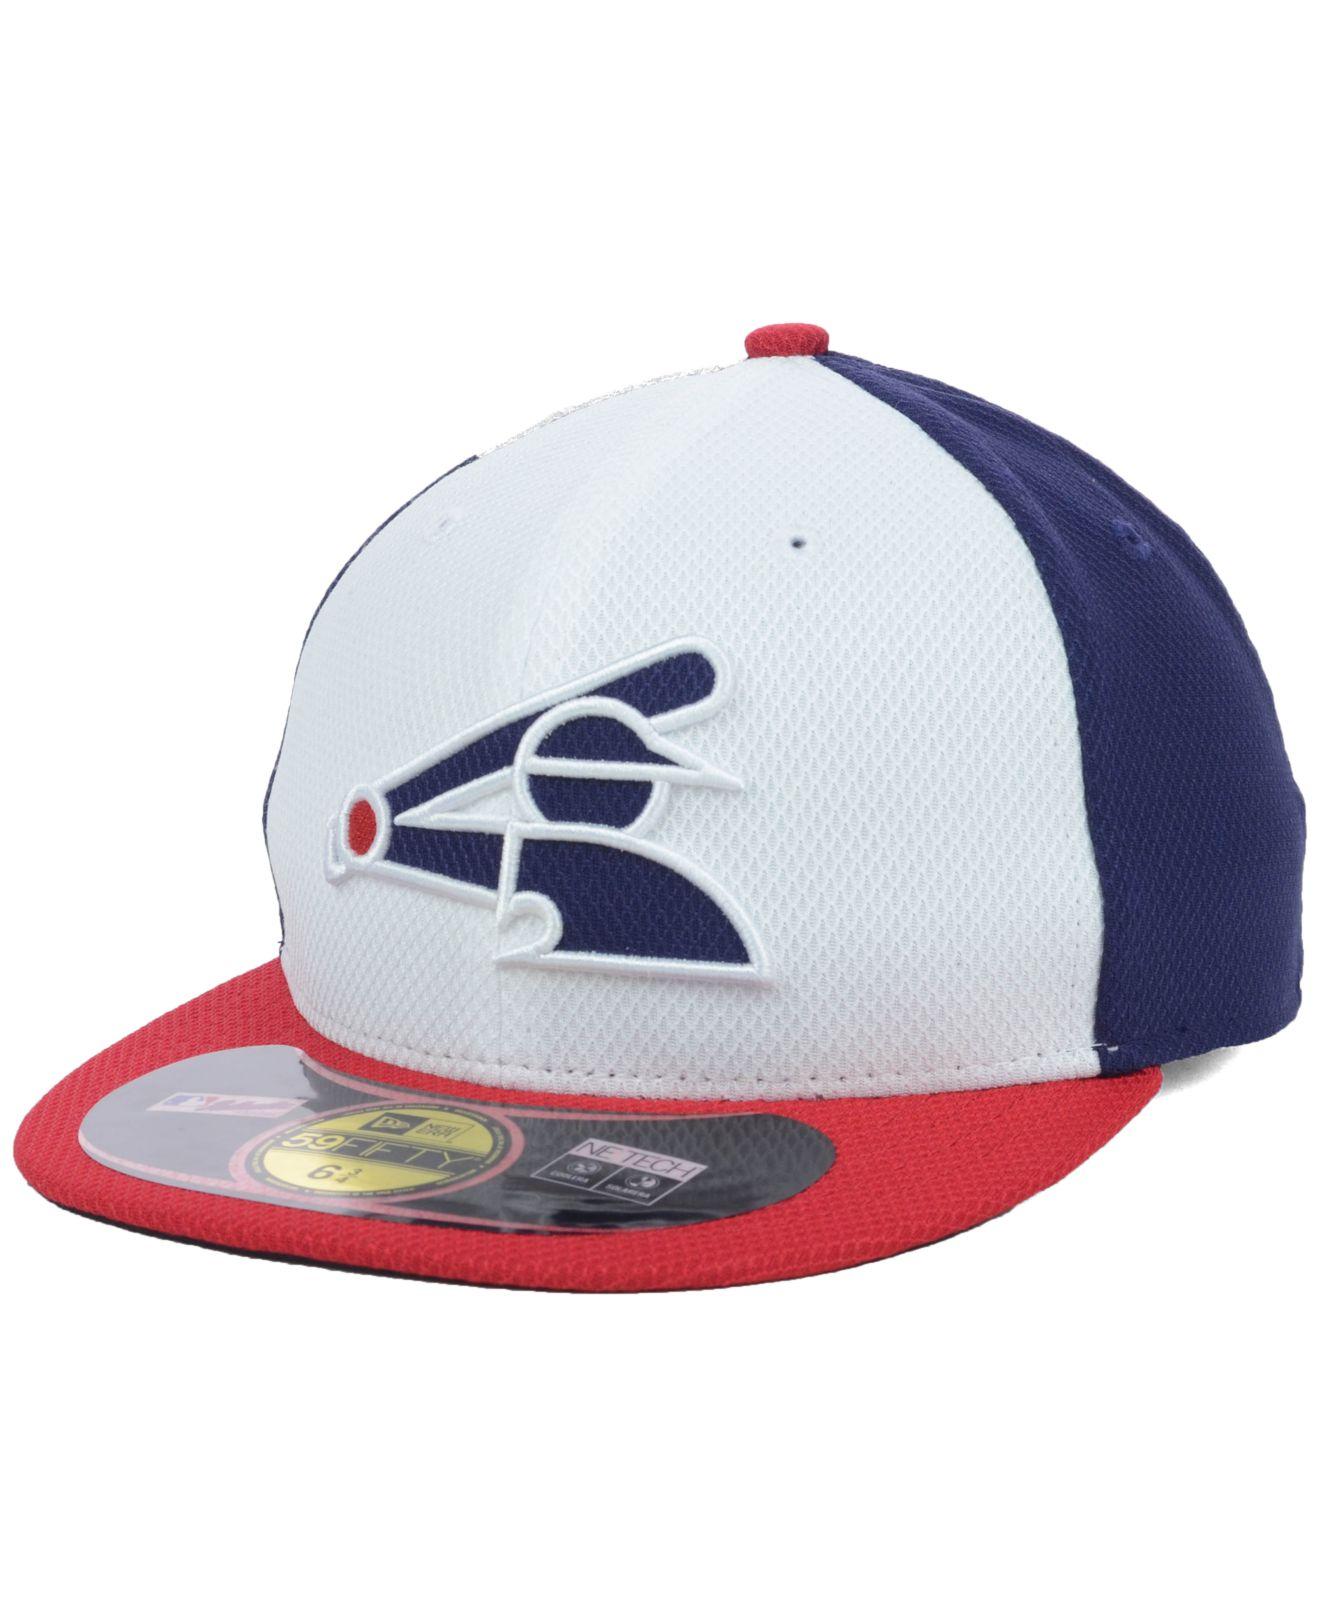 sports shoes 4edec 69a09 KTZ Kids  Chicago White Sox Mlb Diamond Era 59fifty Cap in Blue for ...